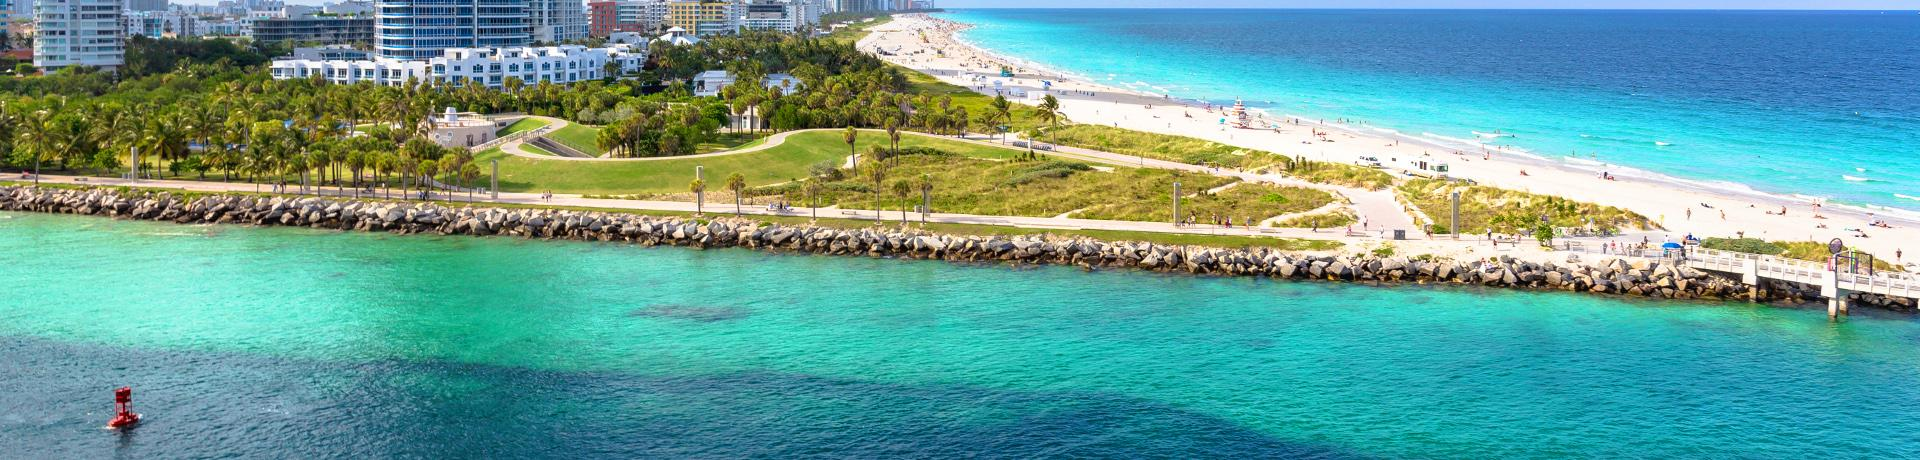 Stadt - Strand - Meer - Miami